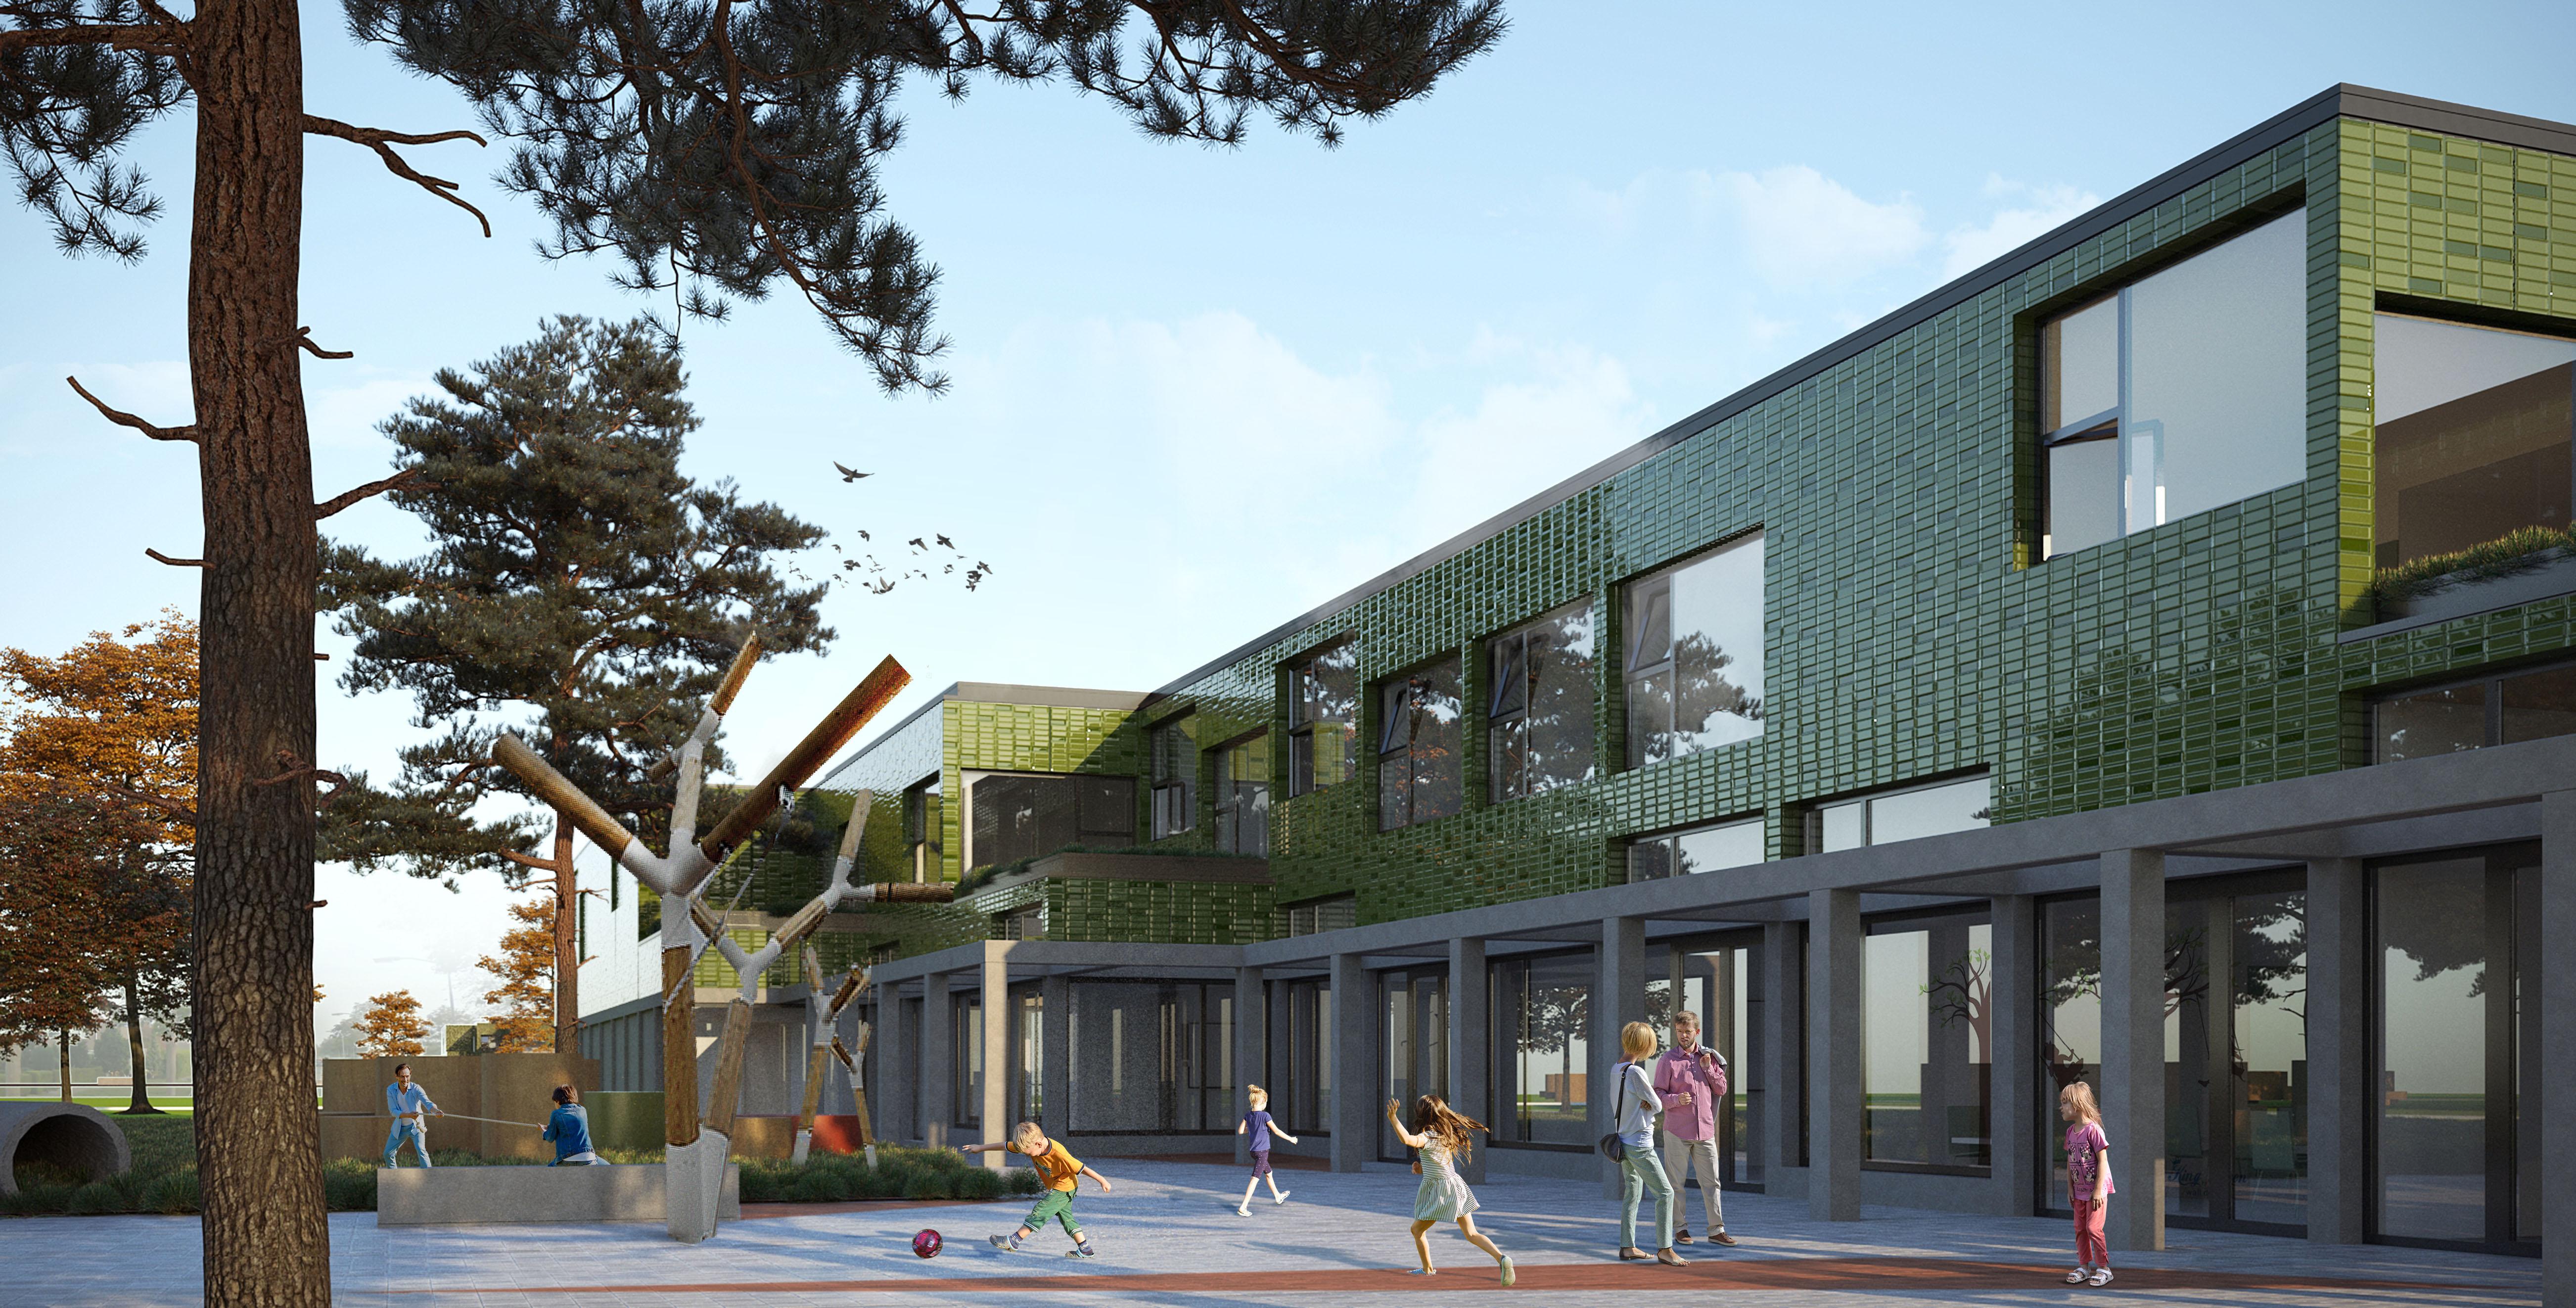 De Villa – Day-care centre with housing